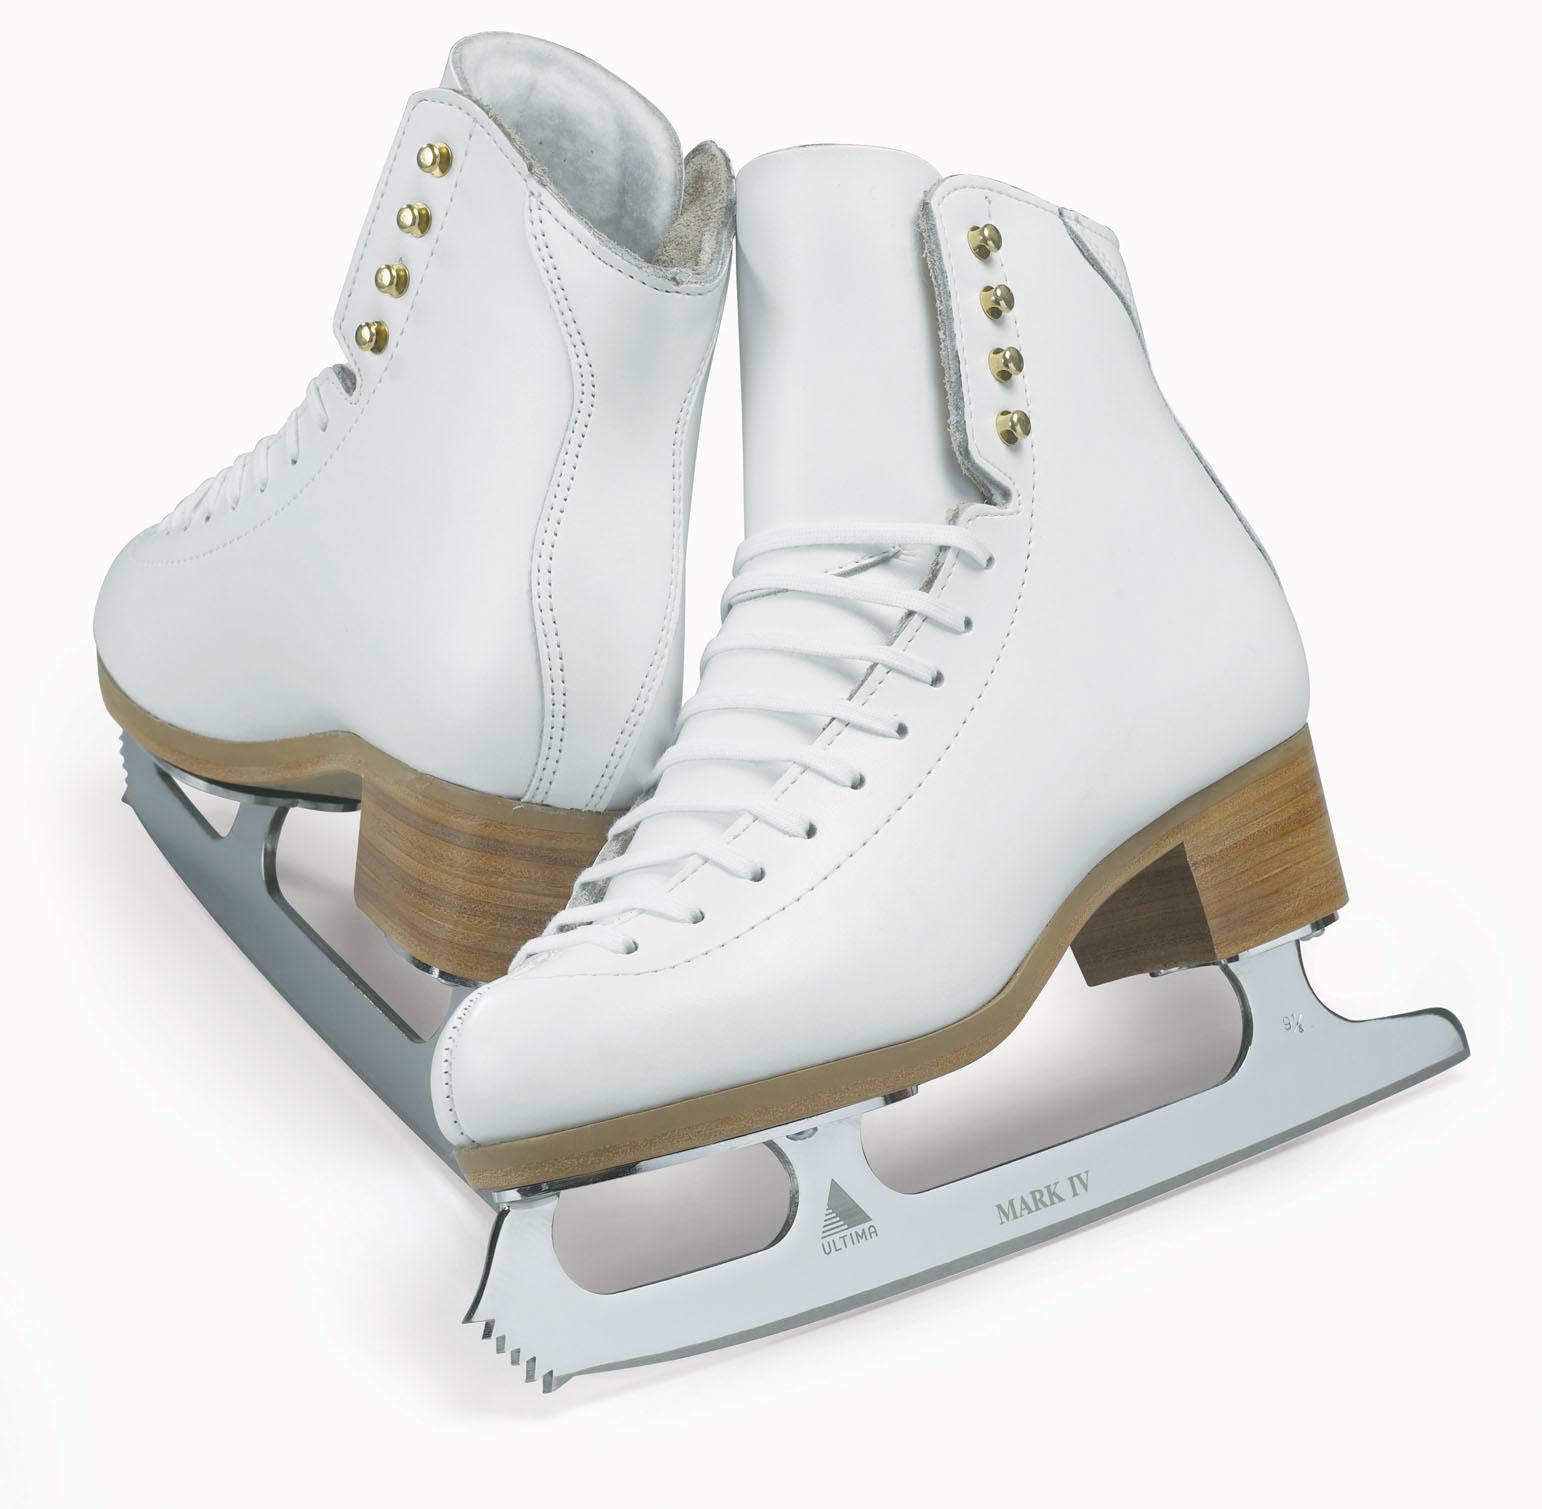 http://2.bp.blogspot.com/-bYDlpAs09ds/TzqbwVN0ziI/AAAAAAAAAOI/AMAqka9hOLI/s1600/White-Ice-Skates-1e95dv2.jpg